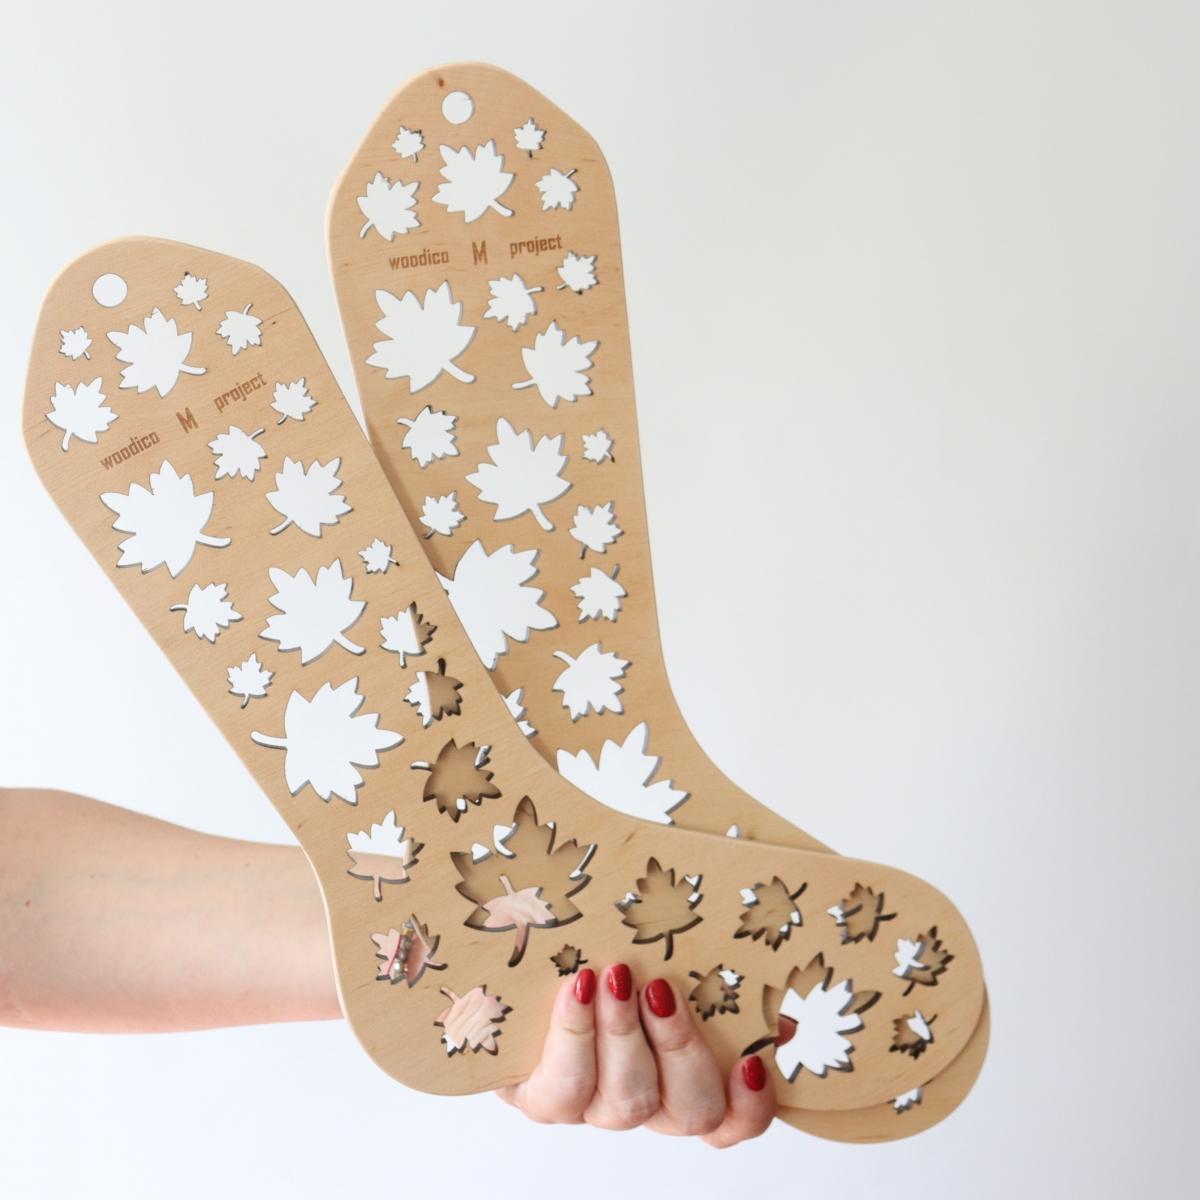 woodico.pro wooden sock blockers maple leaf 7 1200x1200 - Wooden sock blockers / Maple-Leaf